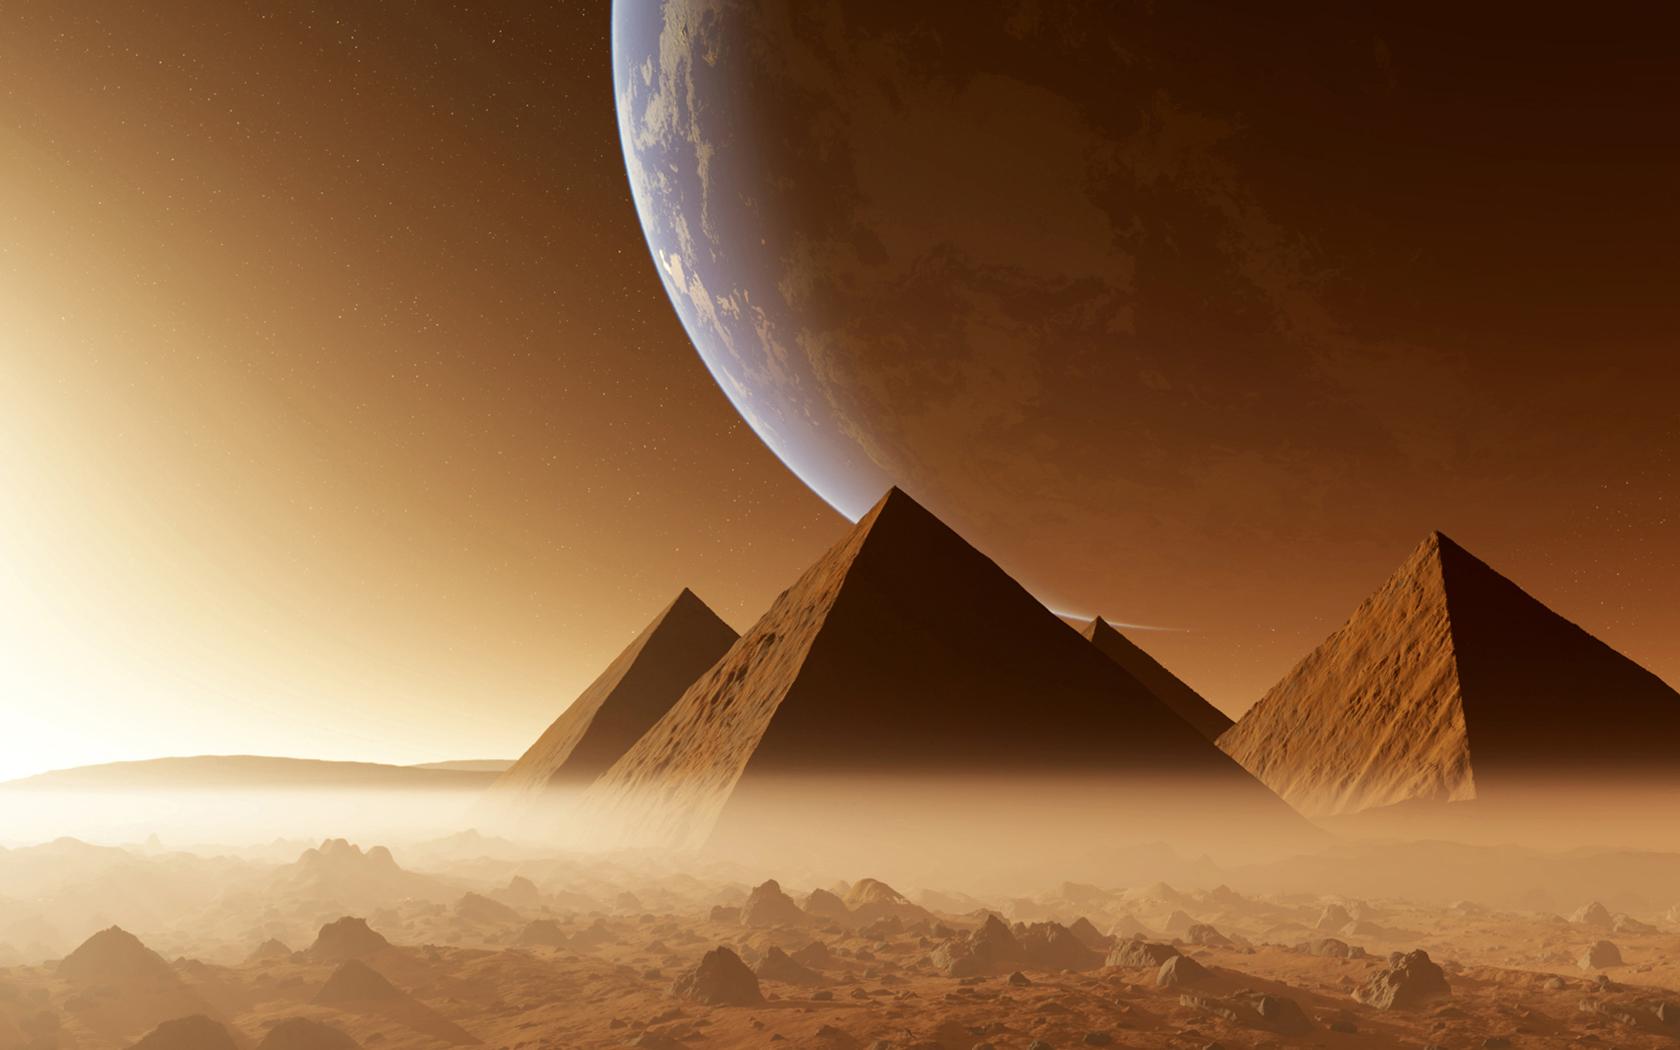 The Egyptian pyramids scenery wallpaper Desktop Background Scenery 1680x1050